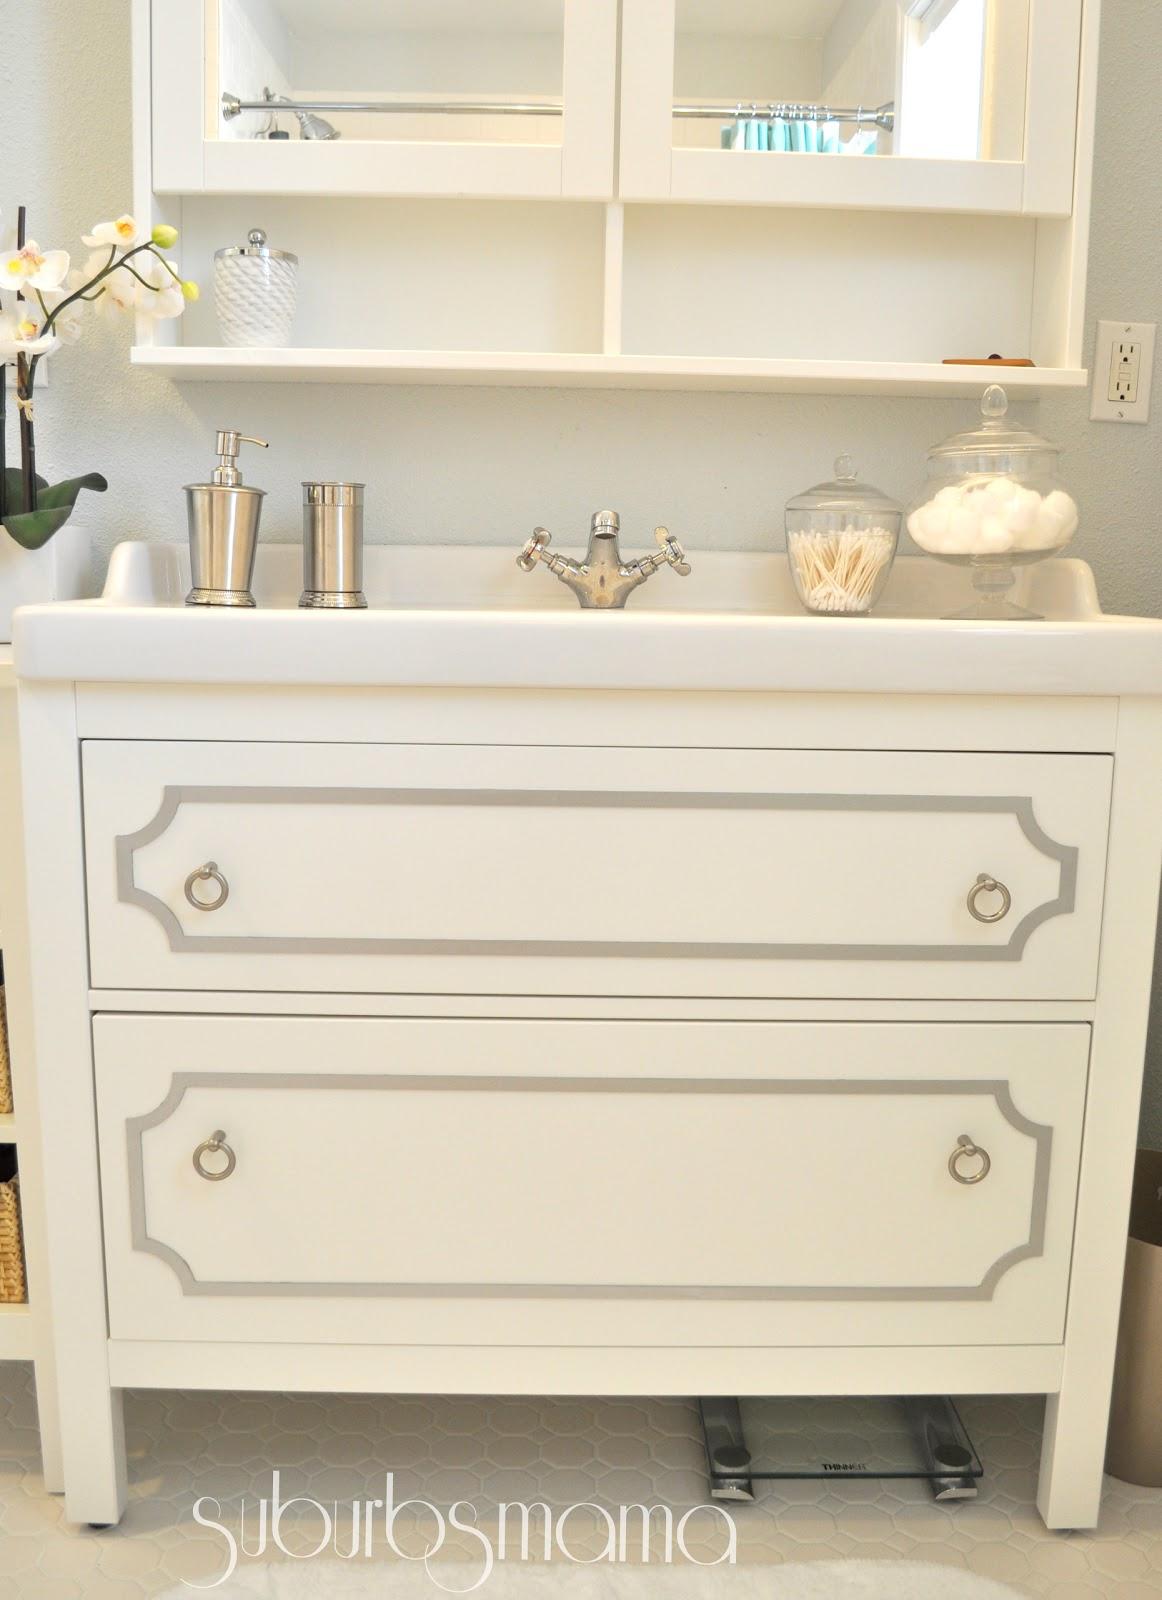 Suburbs mama master bathroom reveal - Ikea bathroom vanity ...